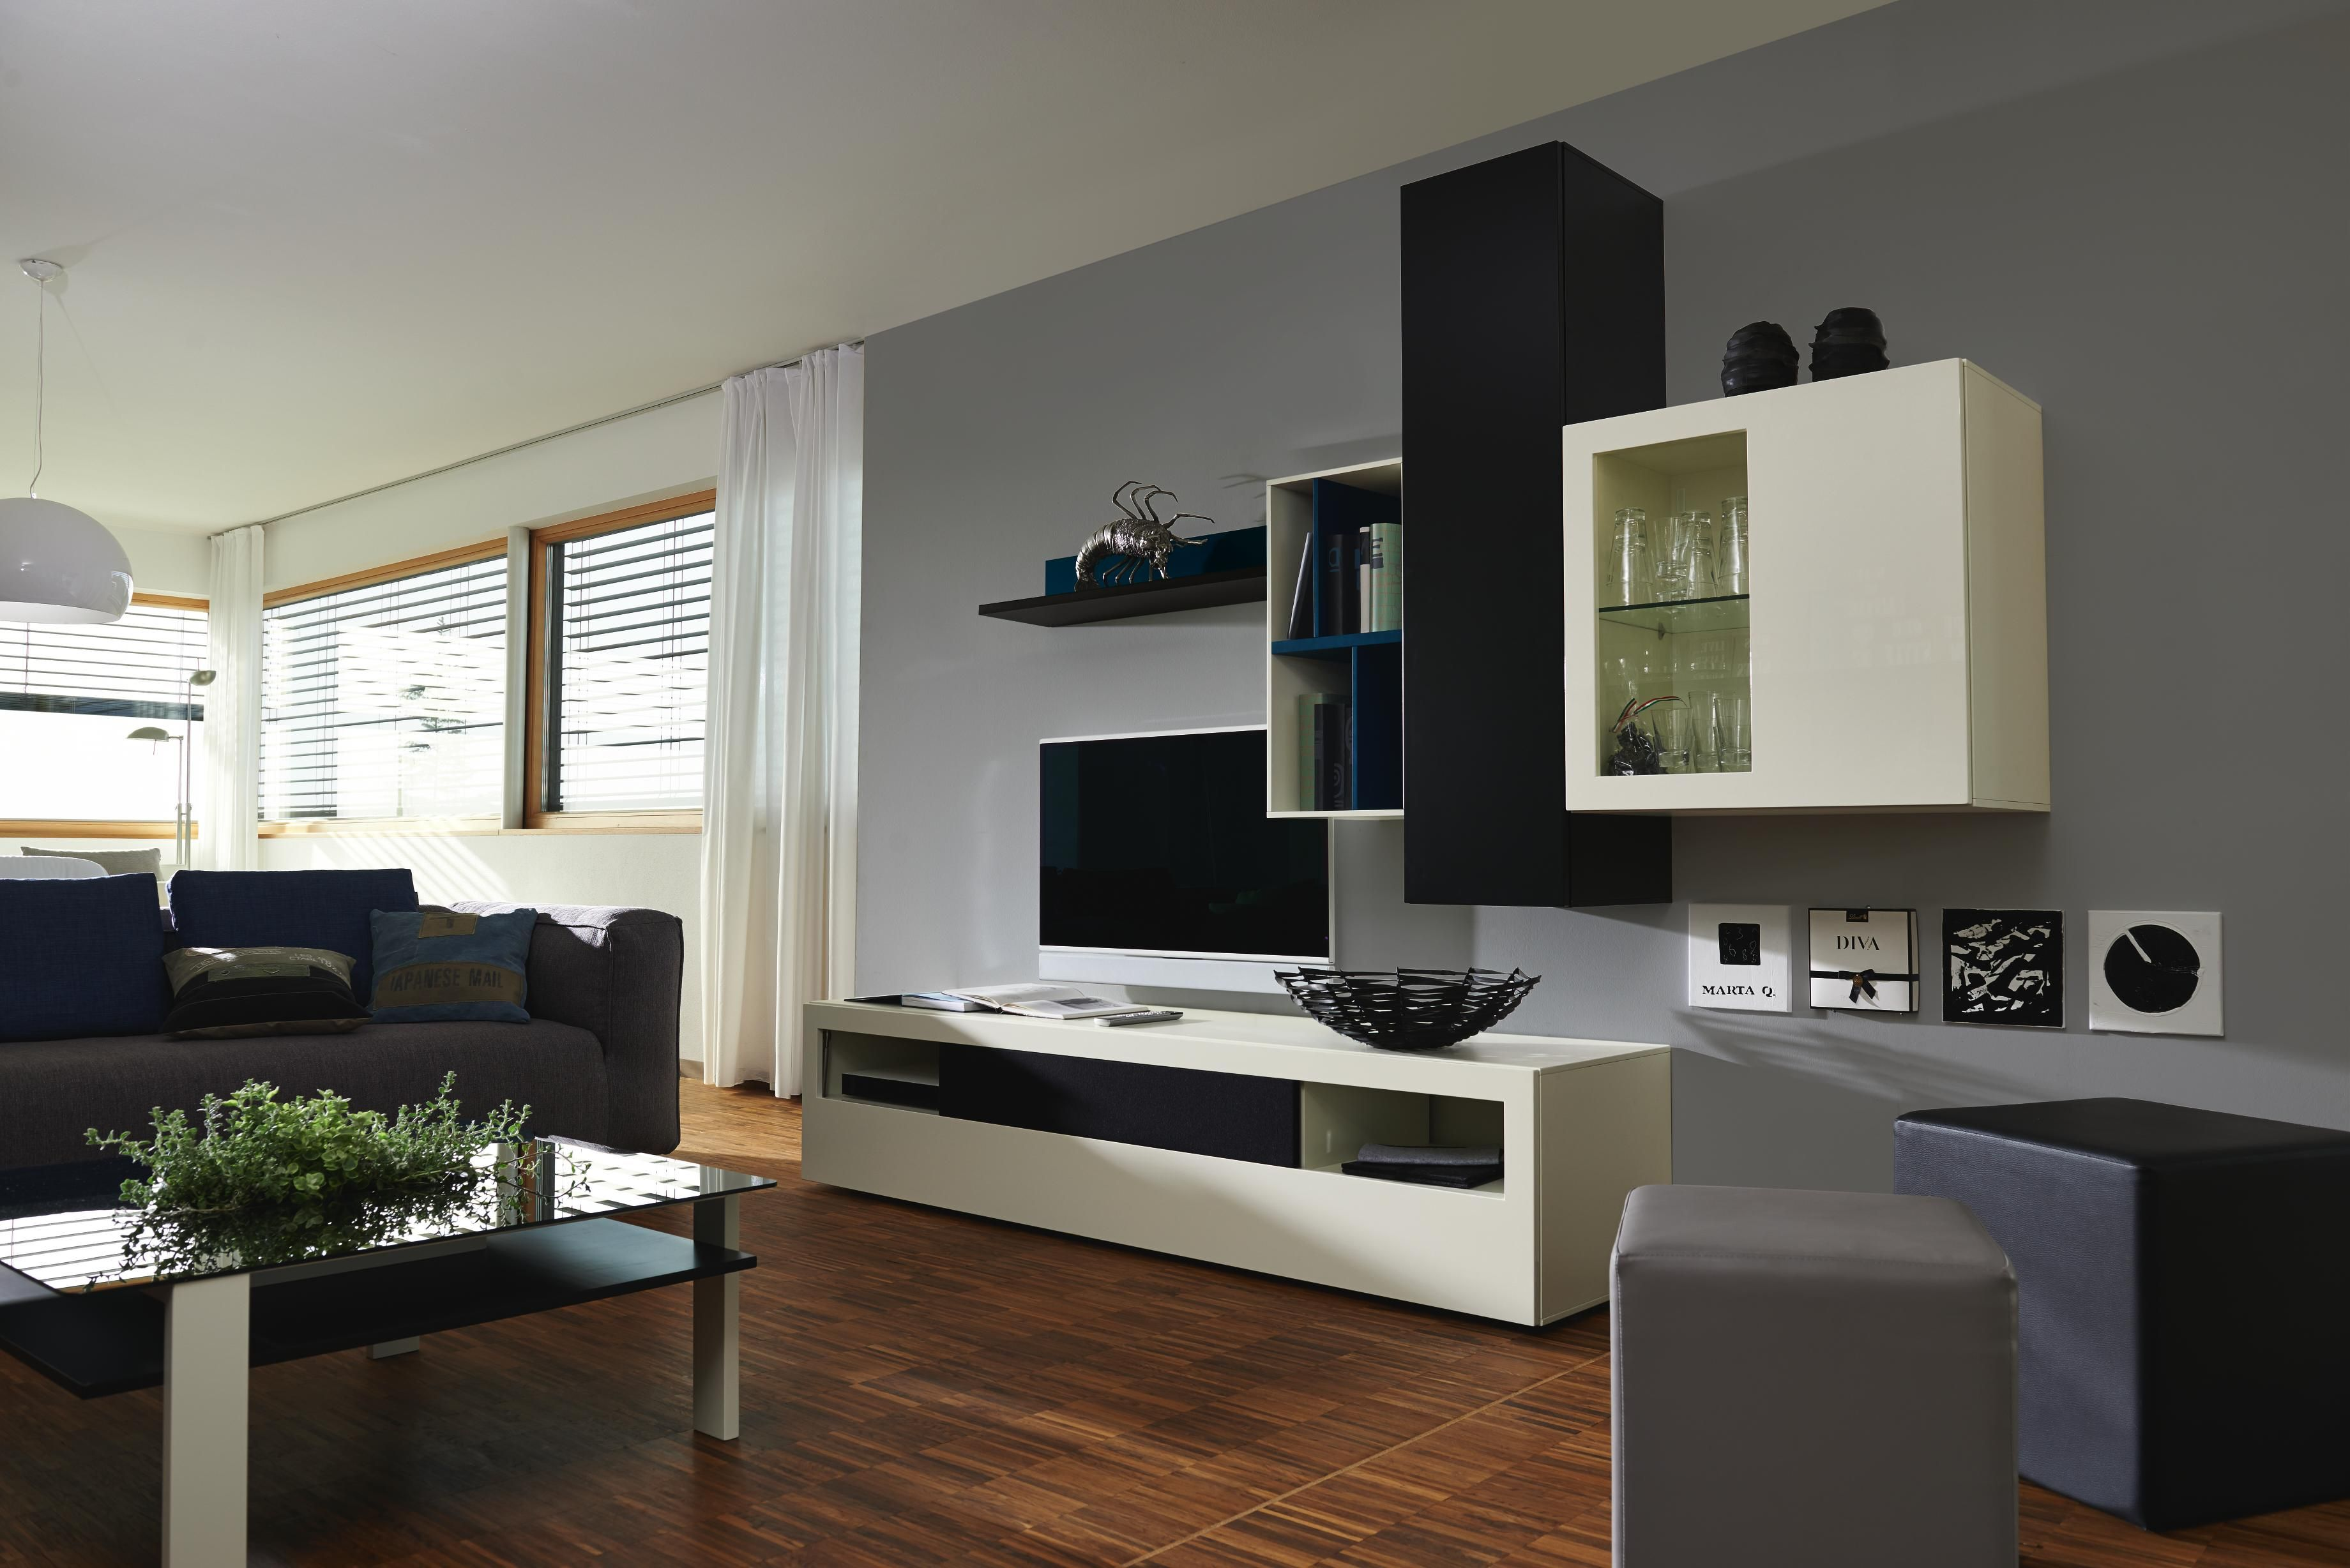 Moderne Wohnwand Style : Wohnwand in petrol schwarz weiß